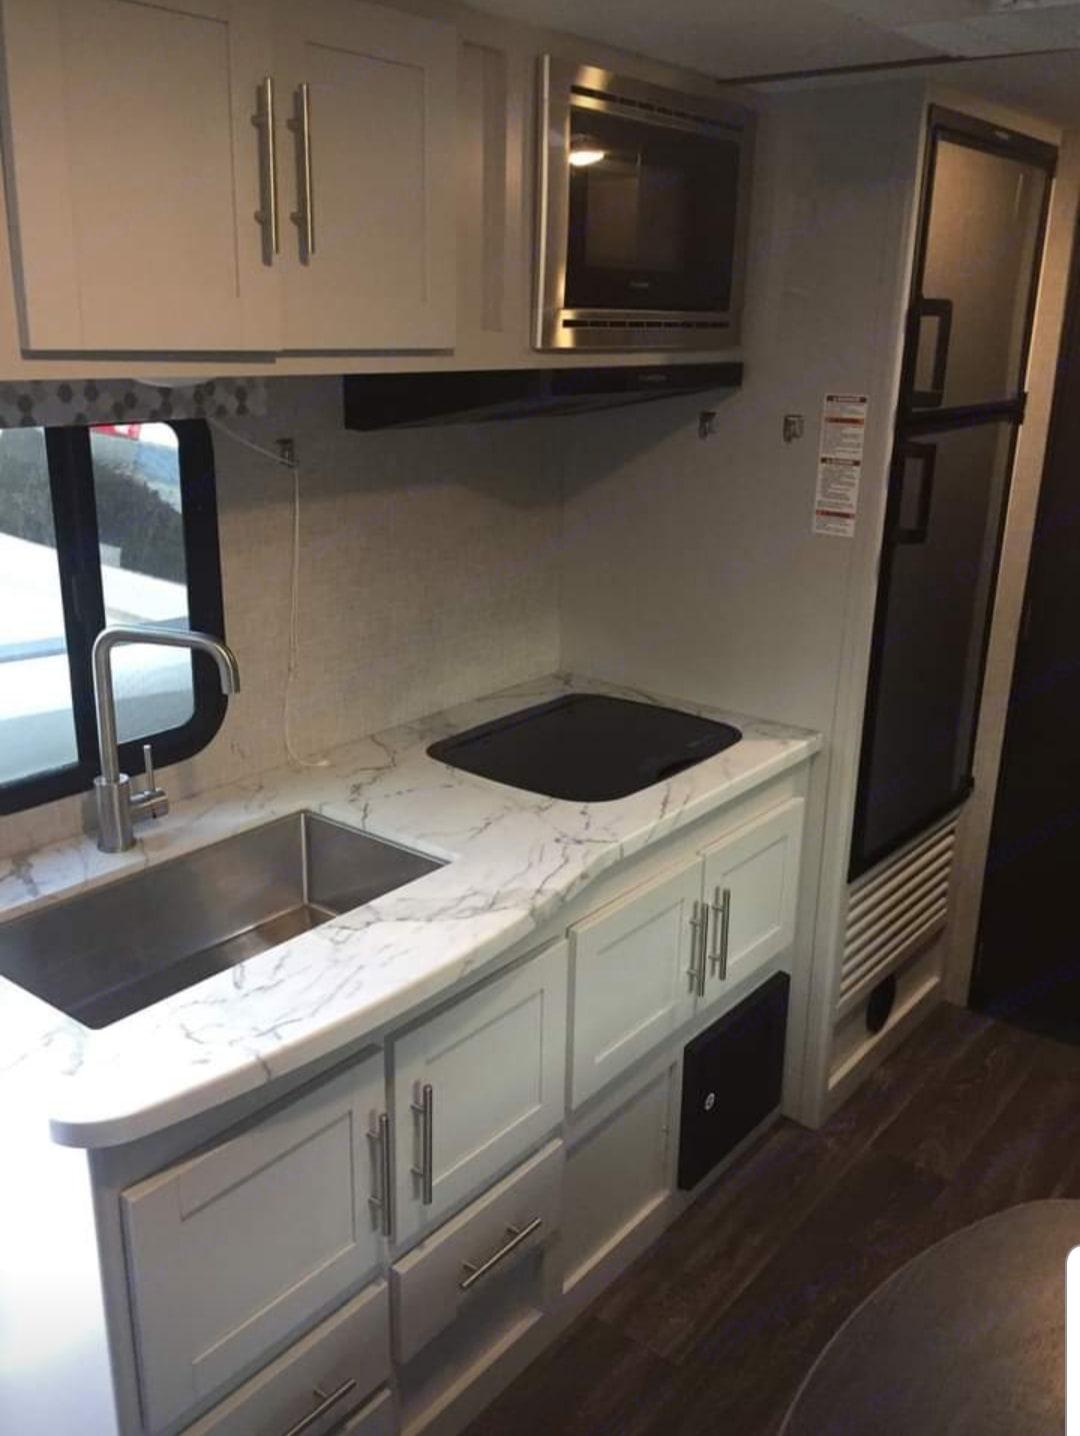 Deep stainless steel sink, real wood cupboards, 2 burner stove, microwave and generous fridge and freezer. . Keystone Bullet 2020